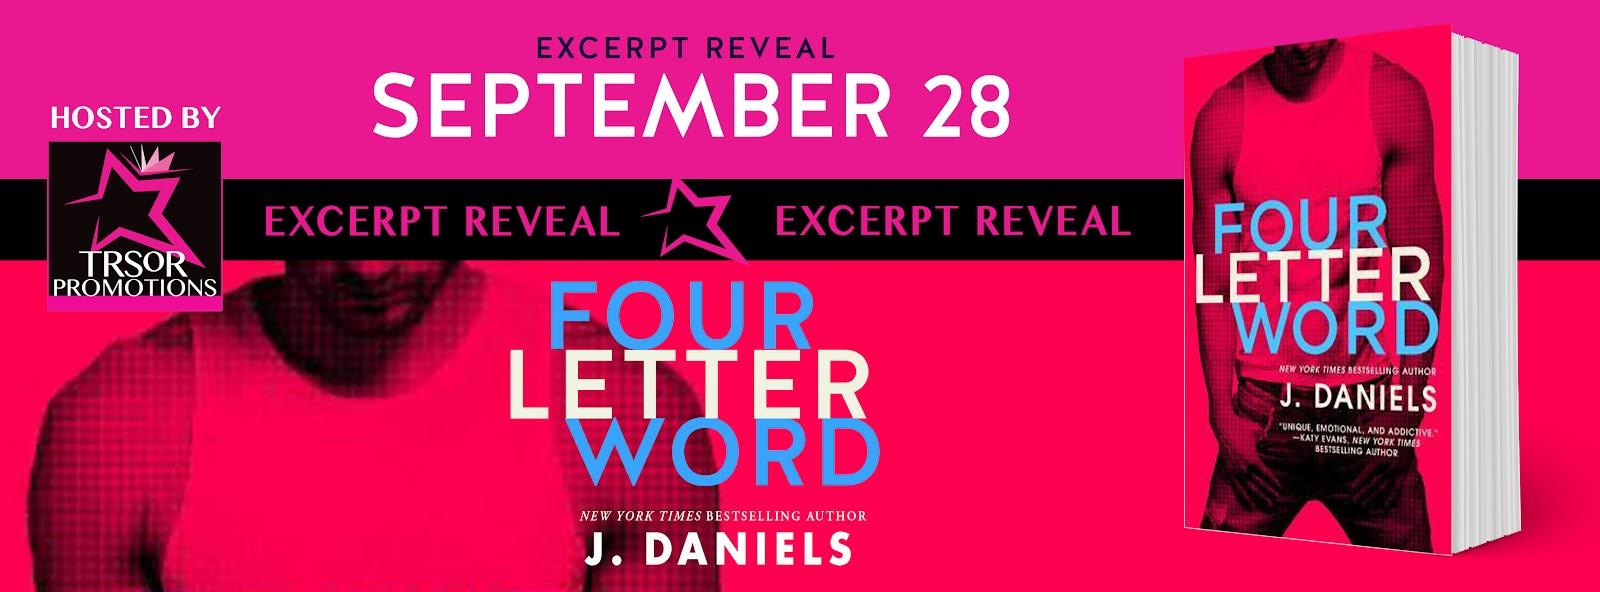 FOUR_LETTER_WORD_EXCERPT.jpg